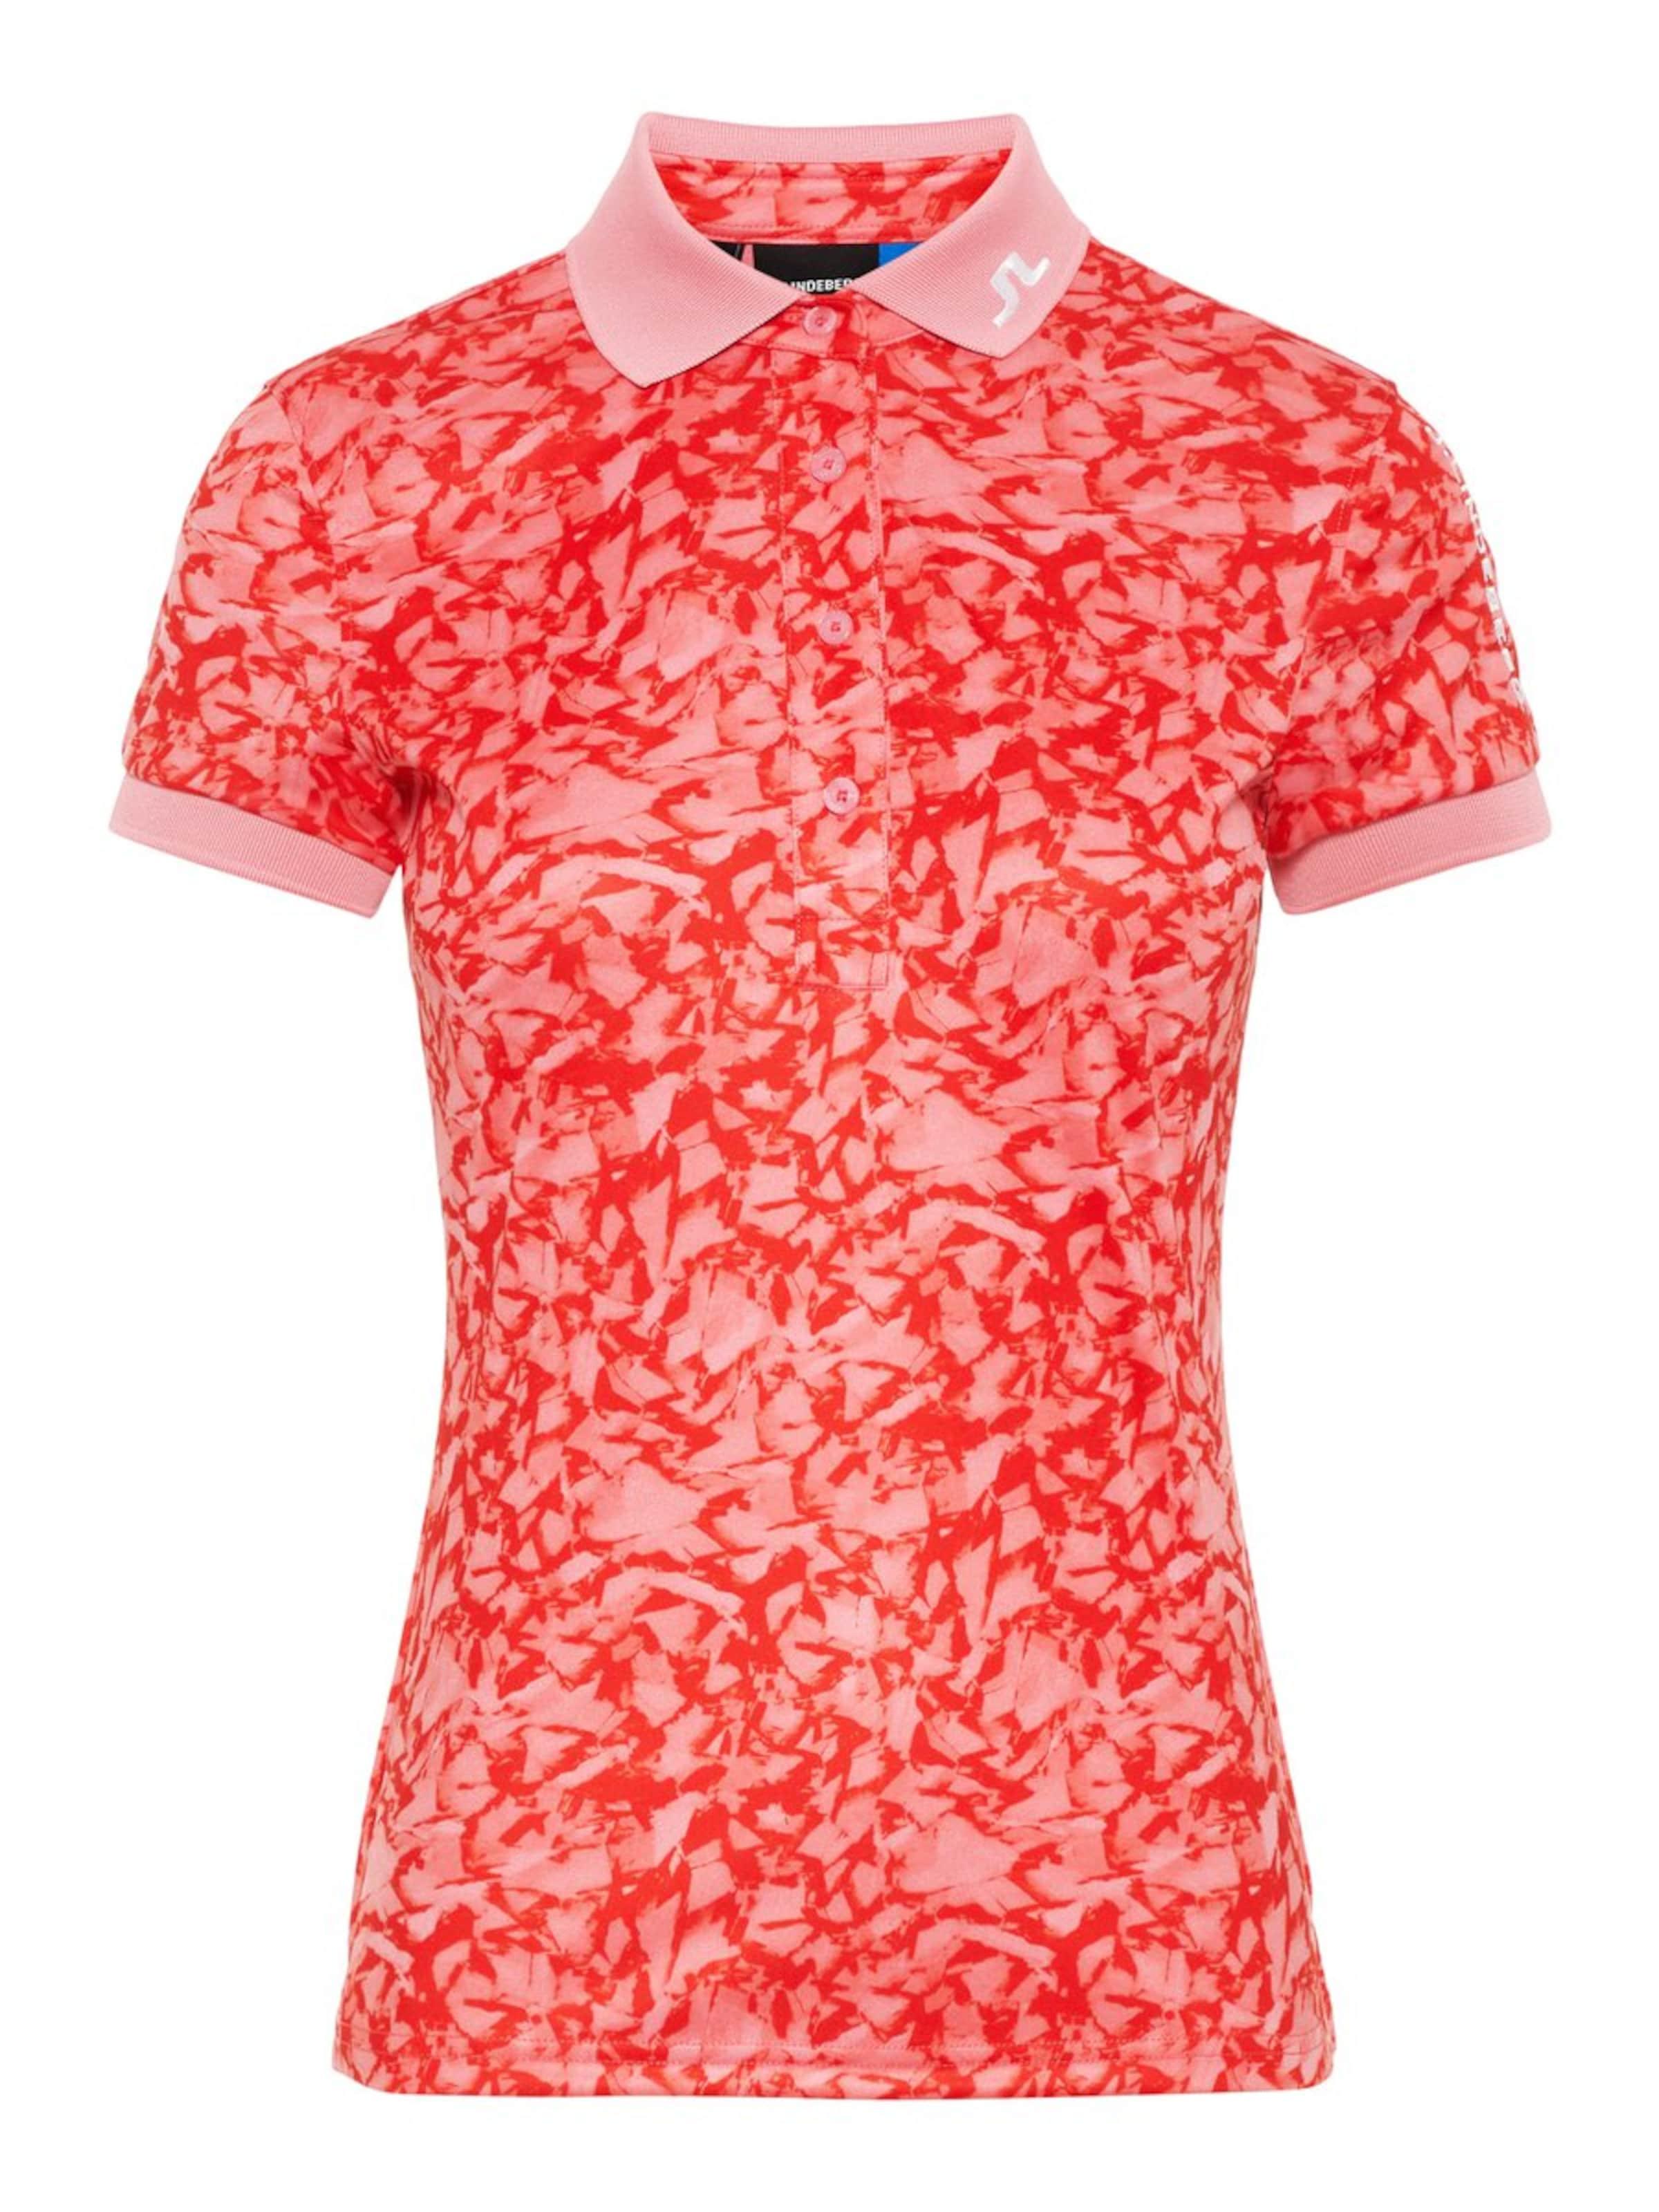 J T 'tour En shirt lindeberg Rose Tech' yv0N8nOmw